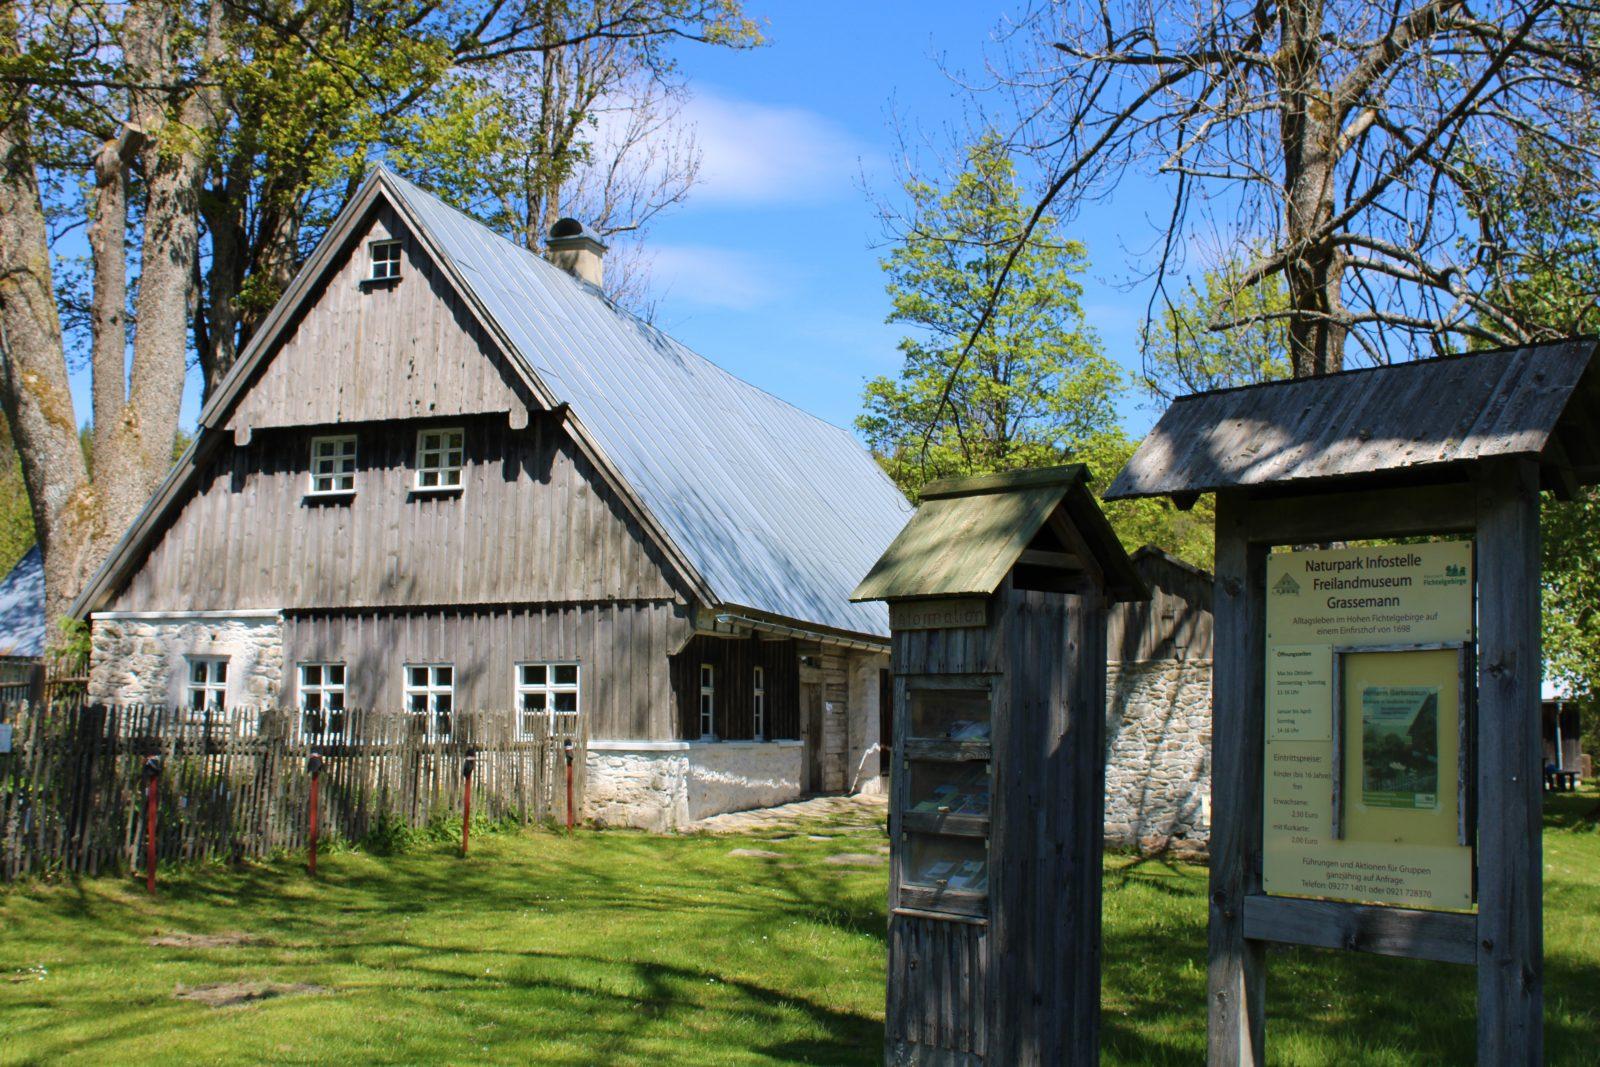 NP-Infostelle Freilandmuseum_Grassemann